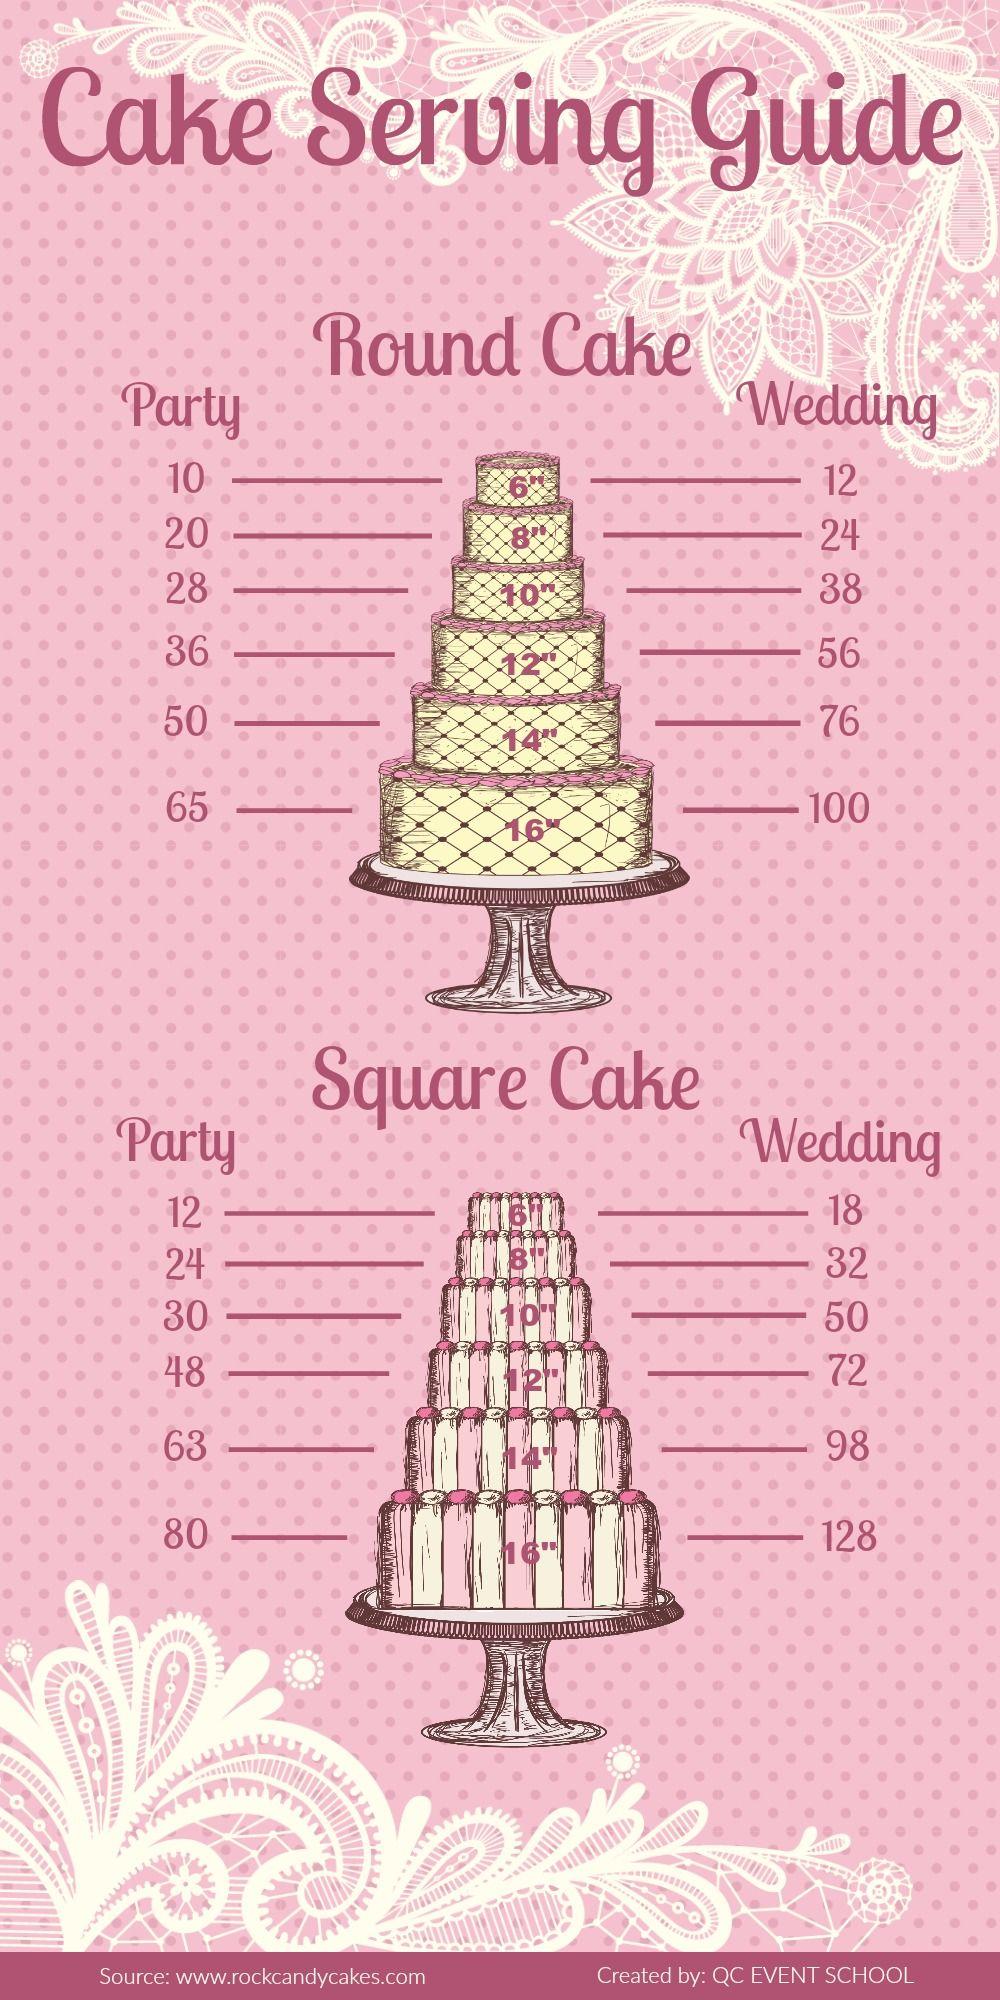 Cake Serving Guide Cake servings